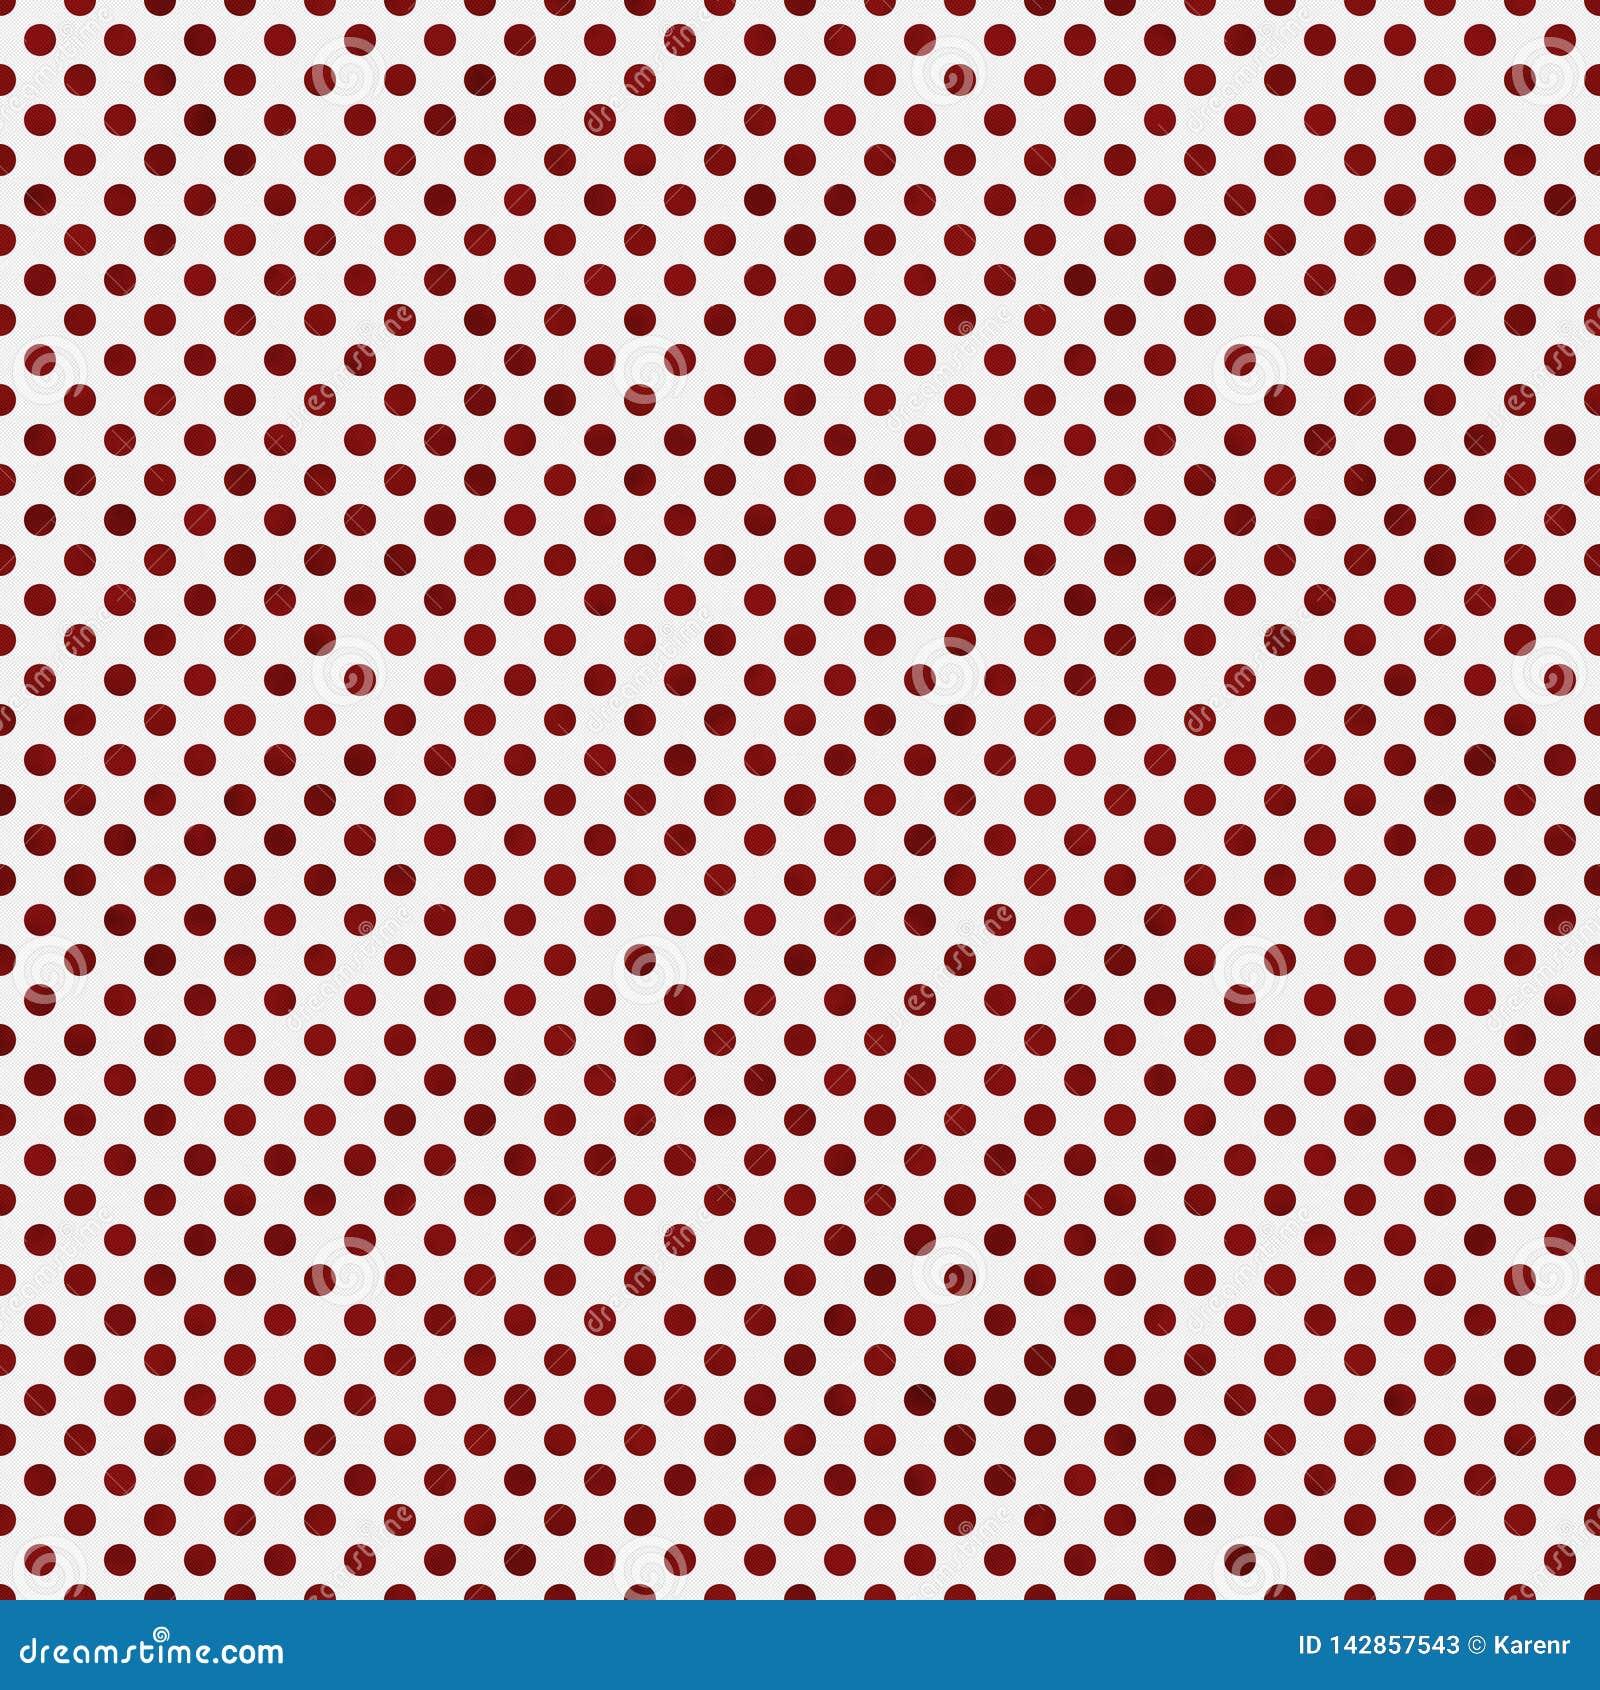 Polca pequena vermelha e branca Dots Pattern Repeat Background